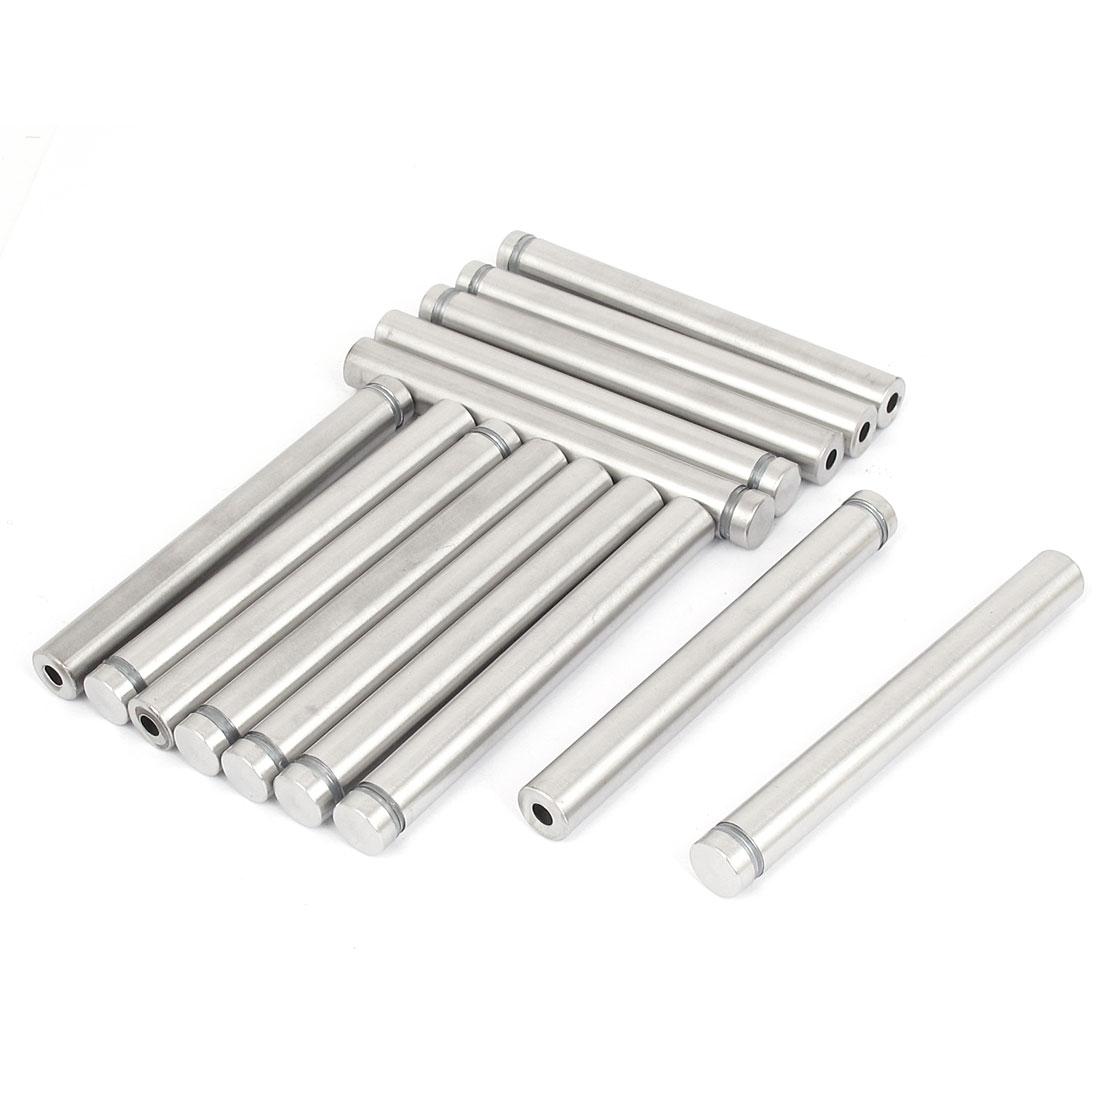 12mm x 100mm Stainless Steel Advertising Frameless Glass Standoff Pin 14pcs